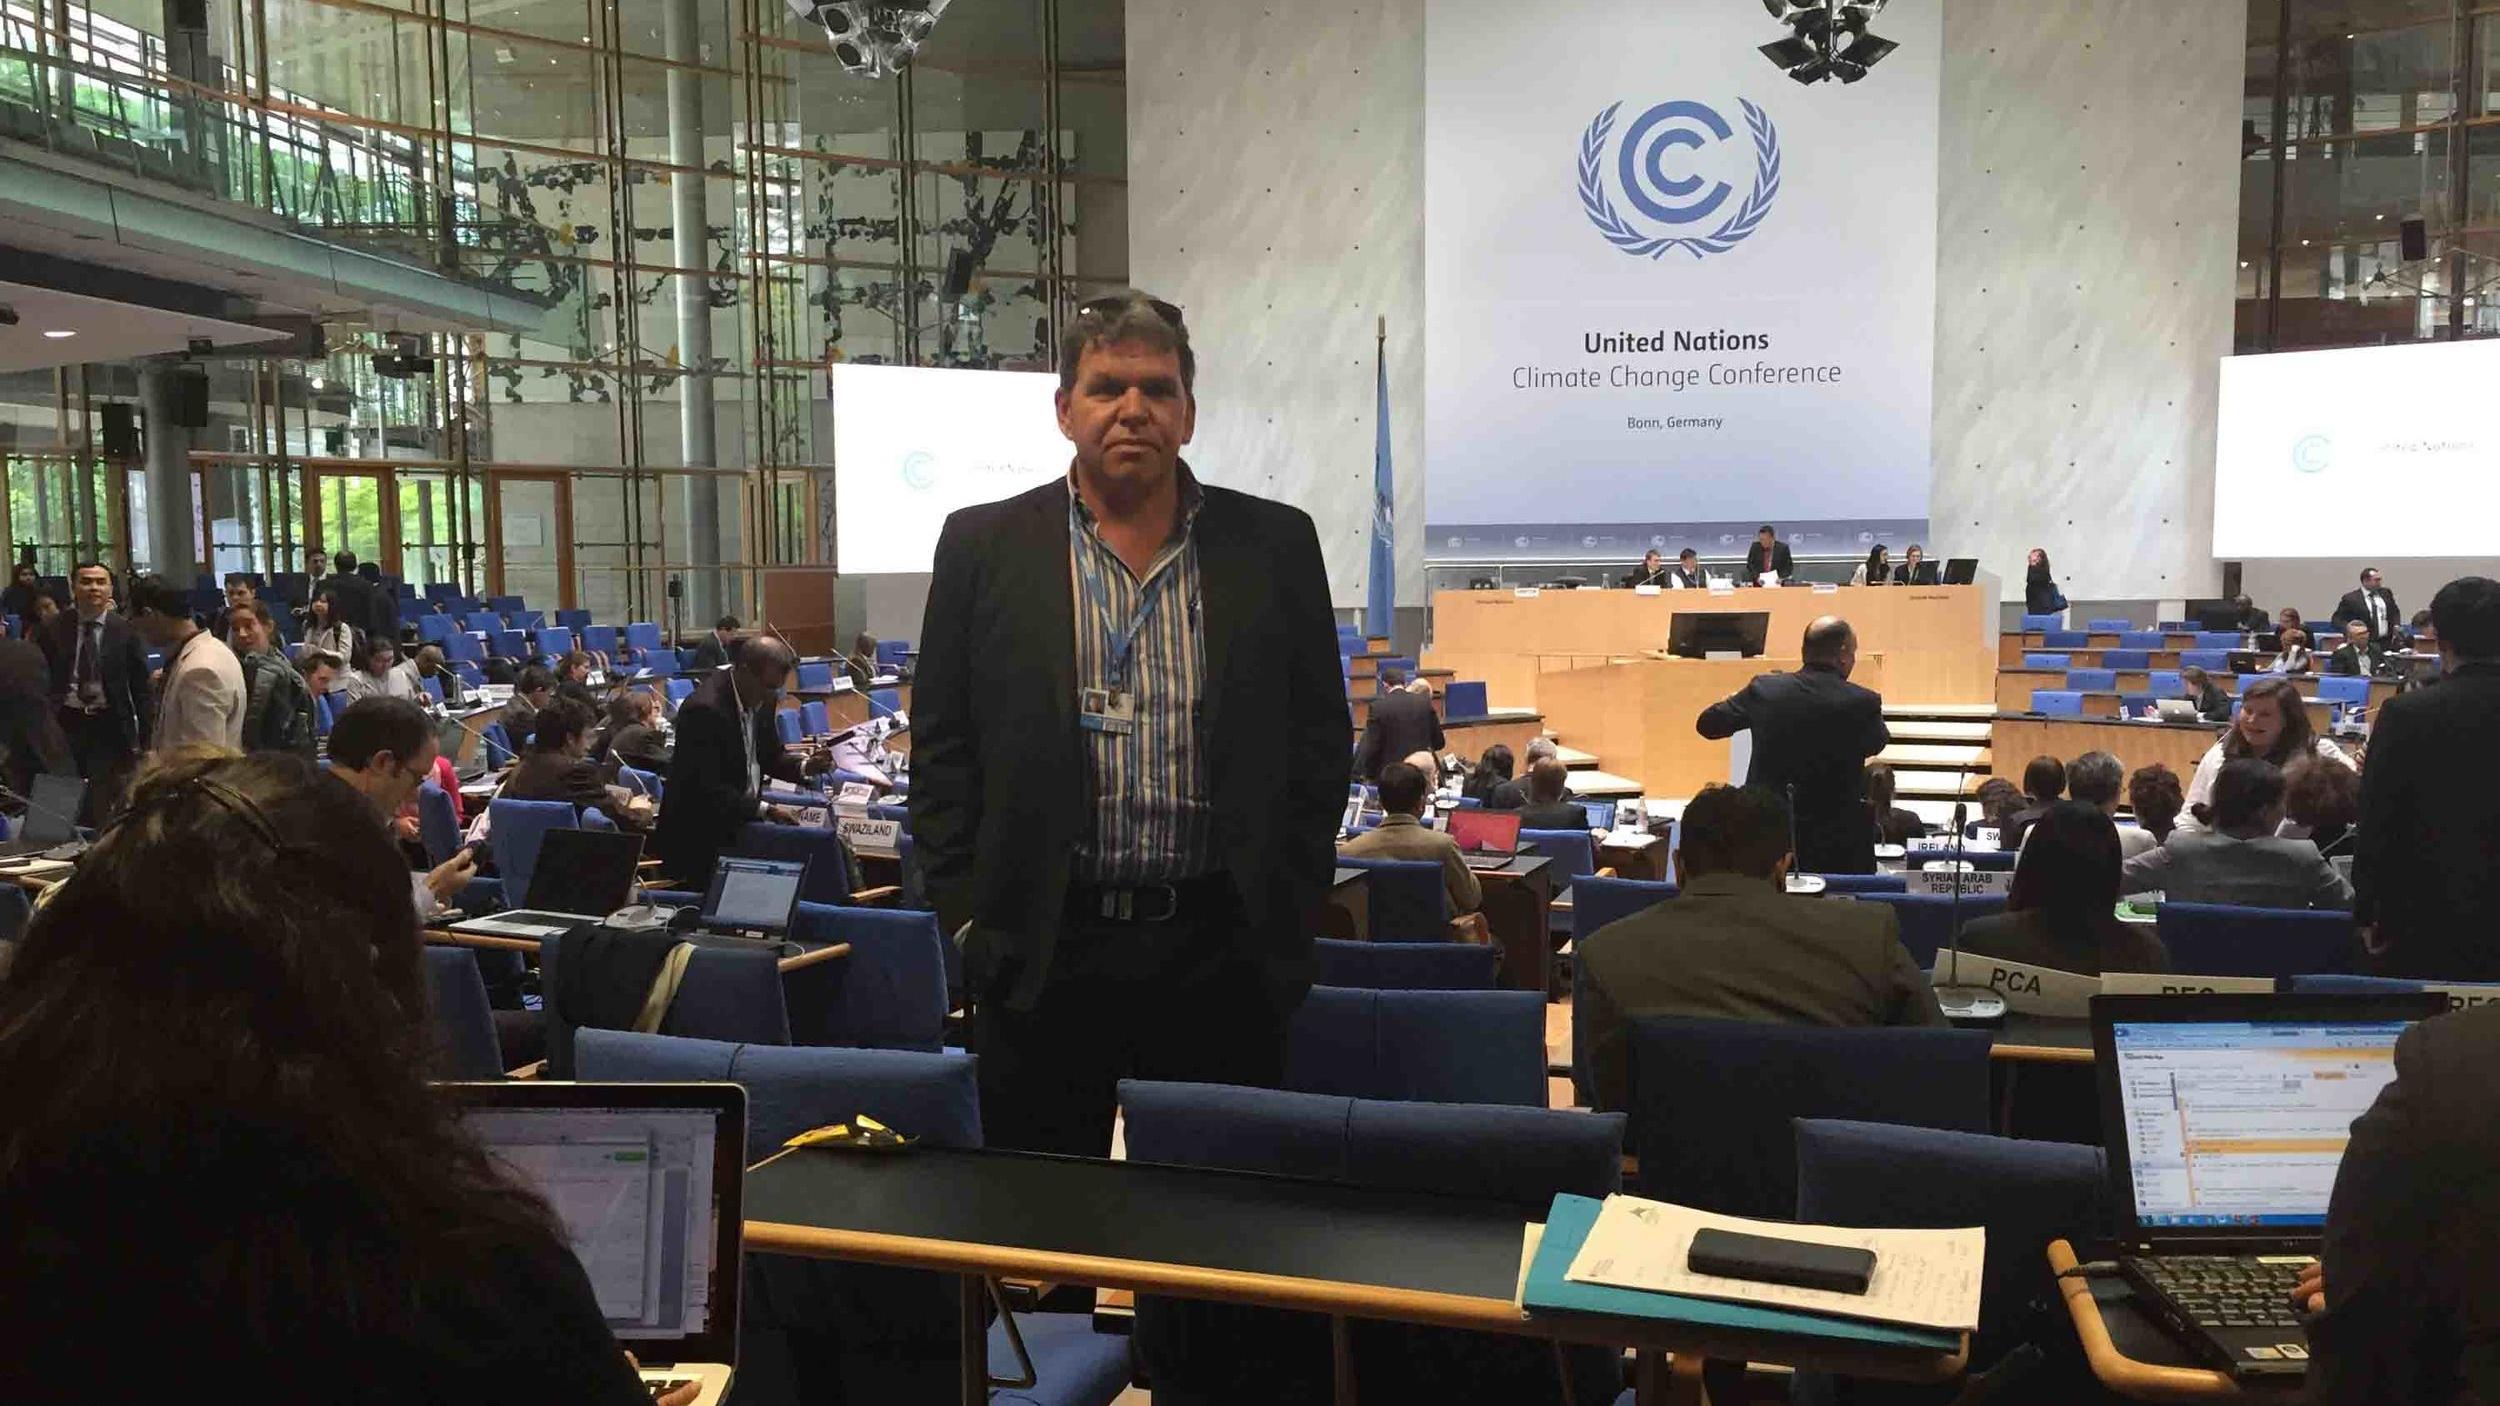 Rowan taking centre stage at UN COP21